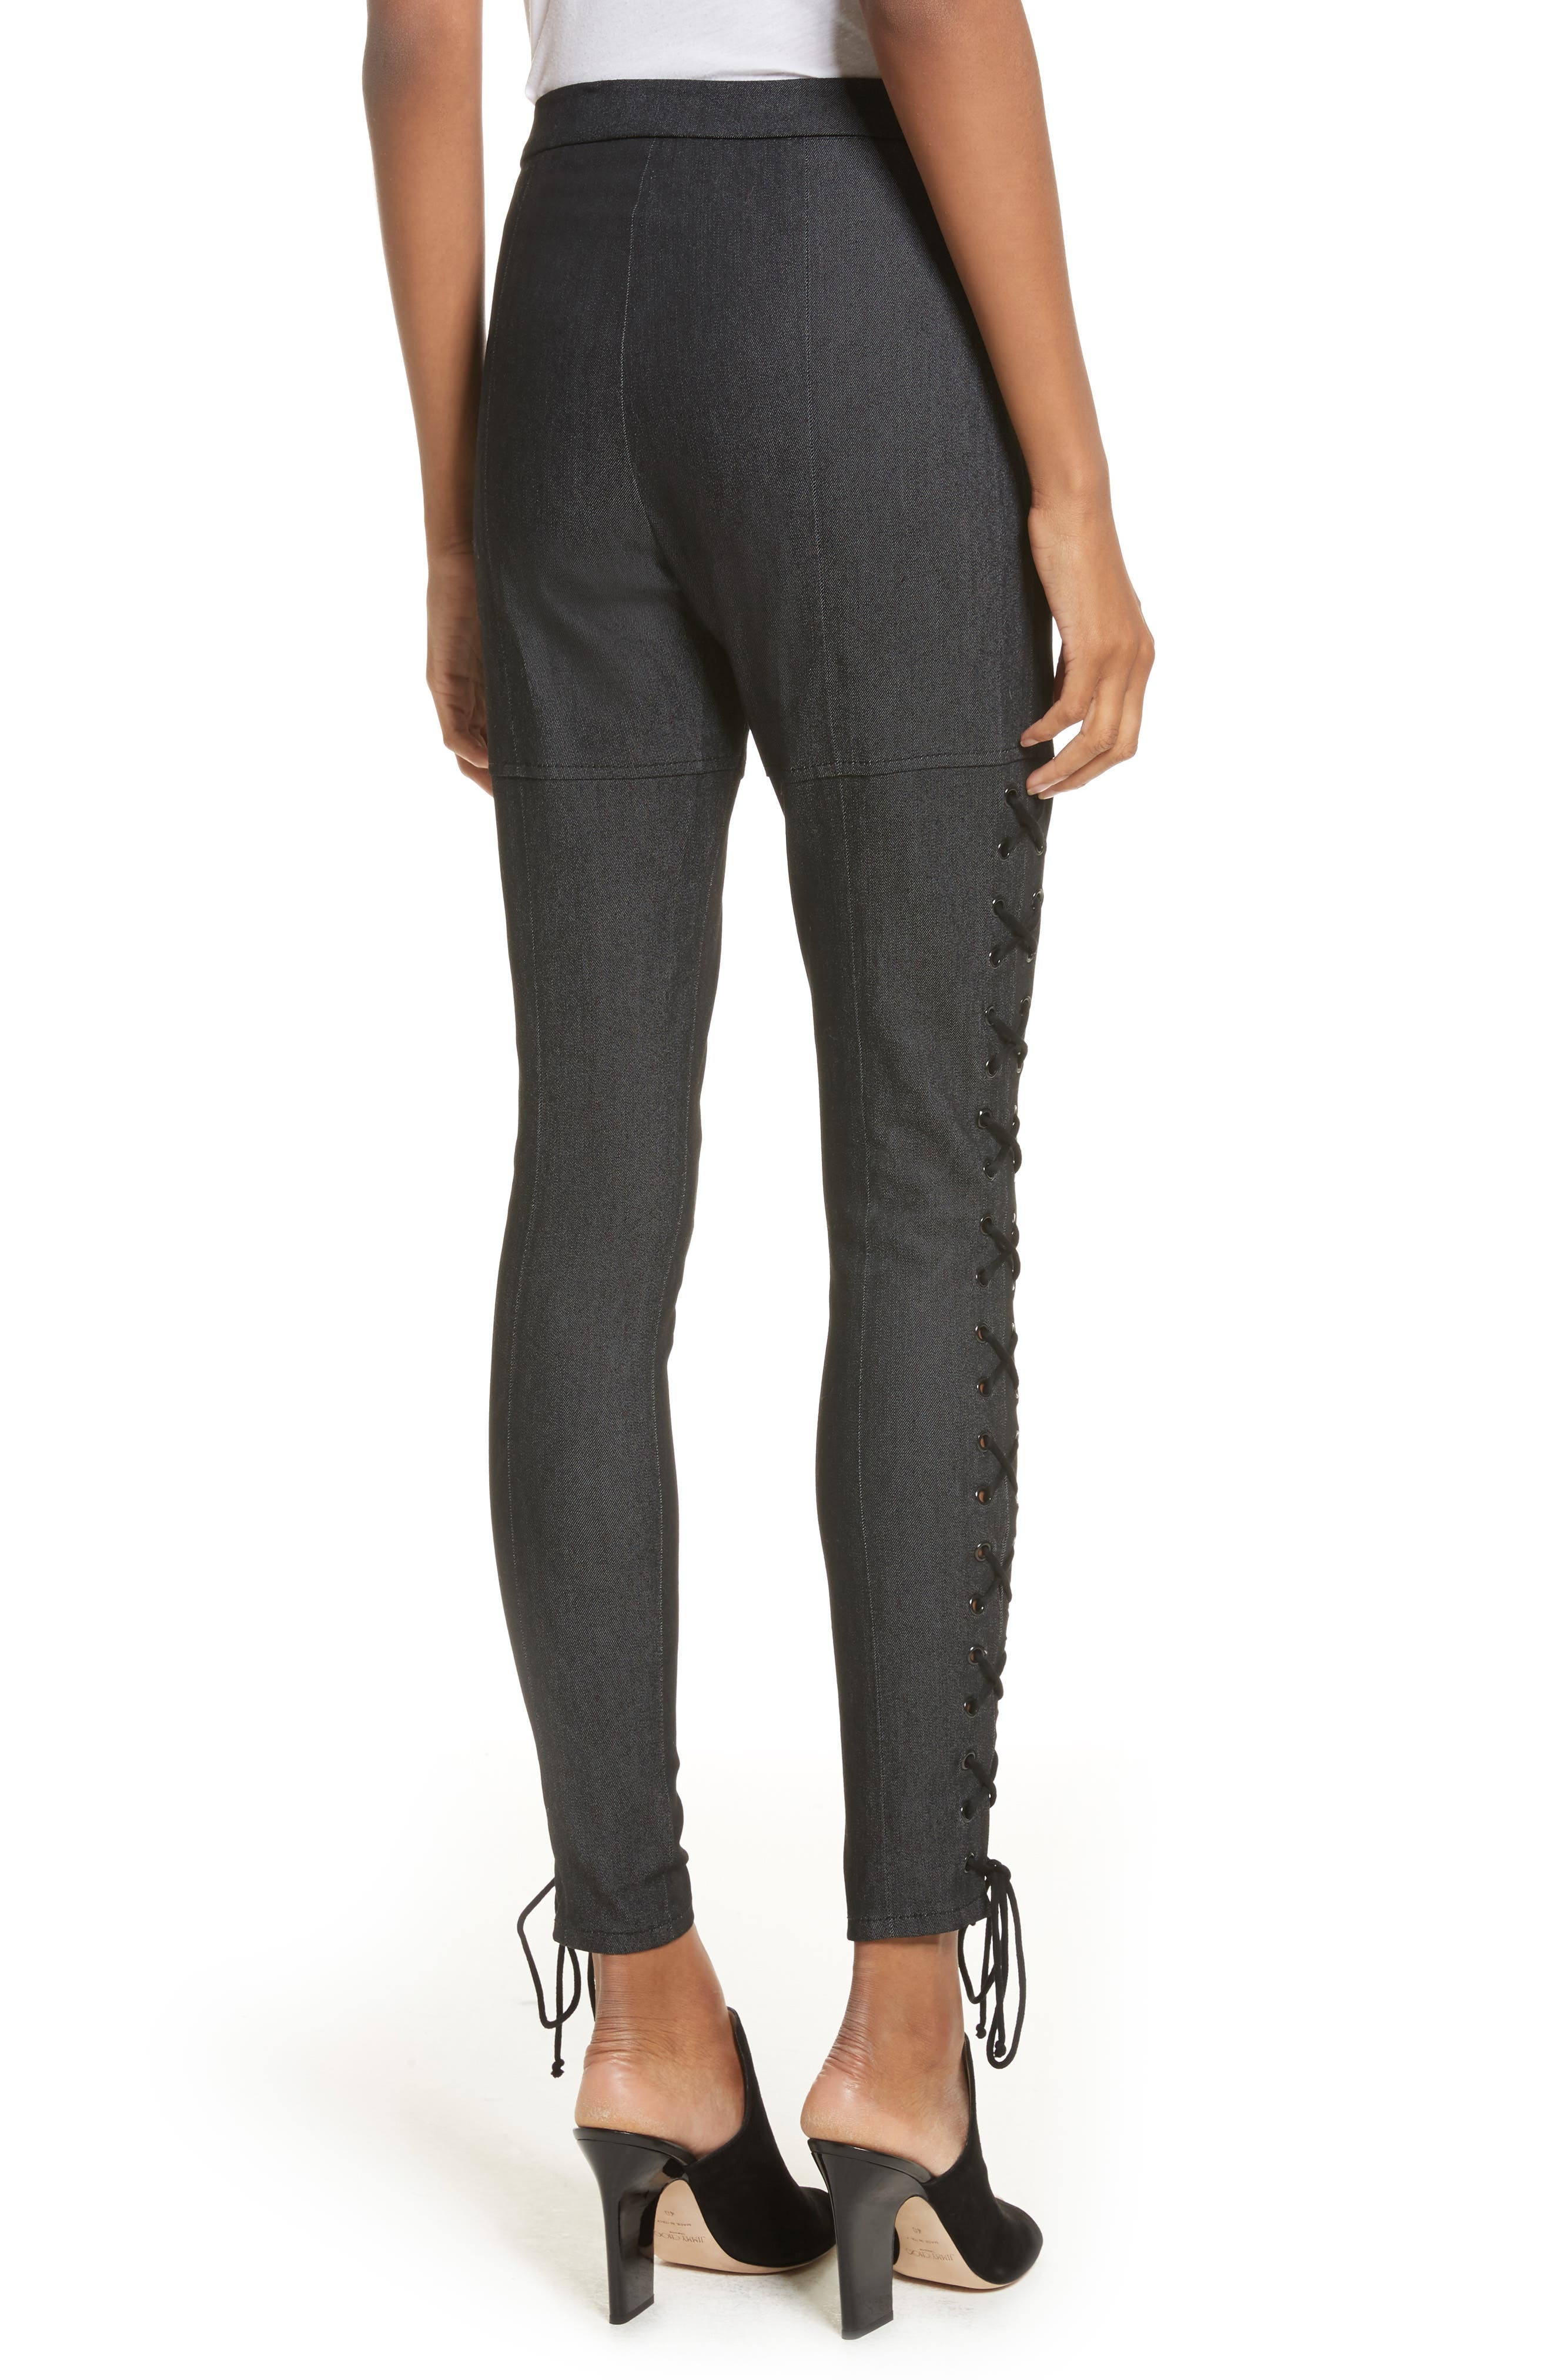 Kiran Lace-Up Stretch Denim Pants,                             Alternate thumbnail 2, color,                             001